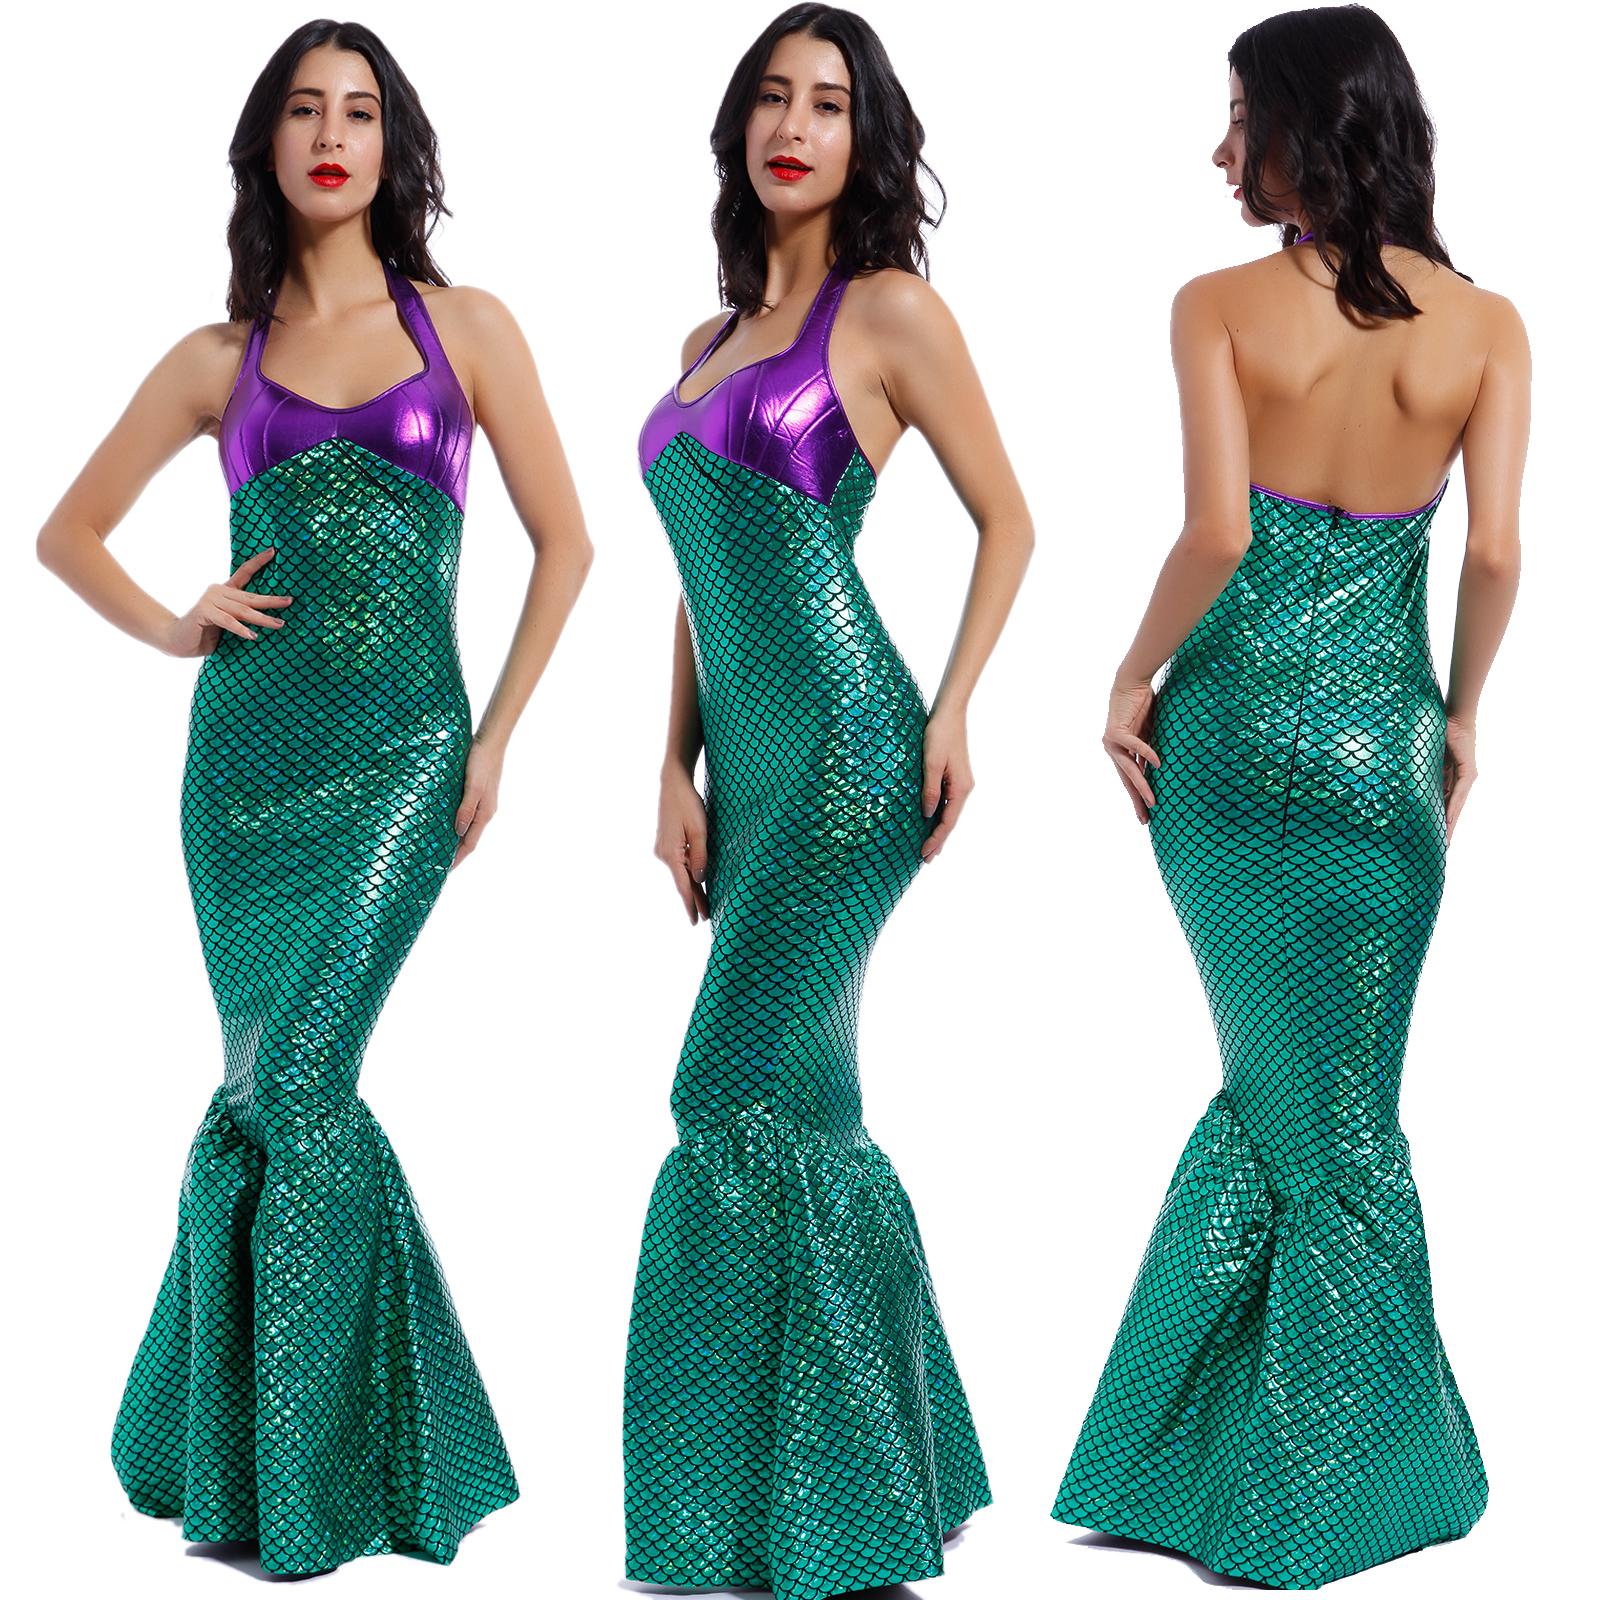 Adult Mermaid Fancy Dress Costume Women Hen Party Outfit Fairytale ...